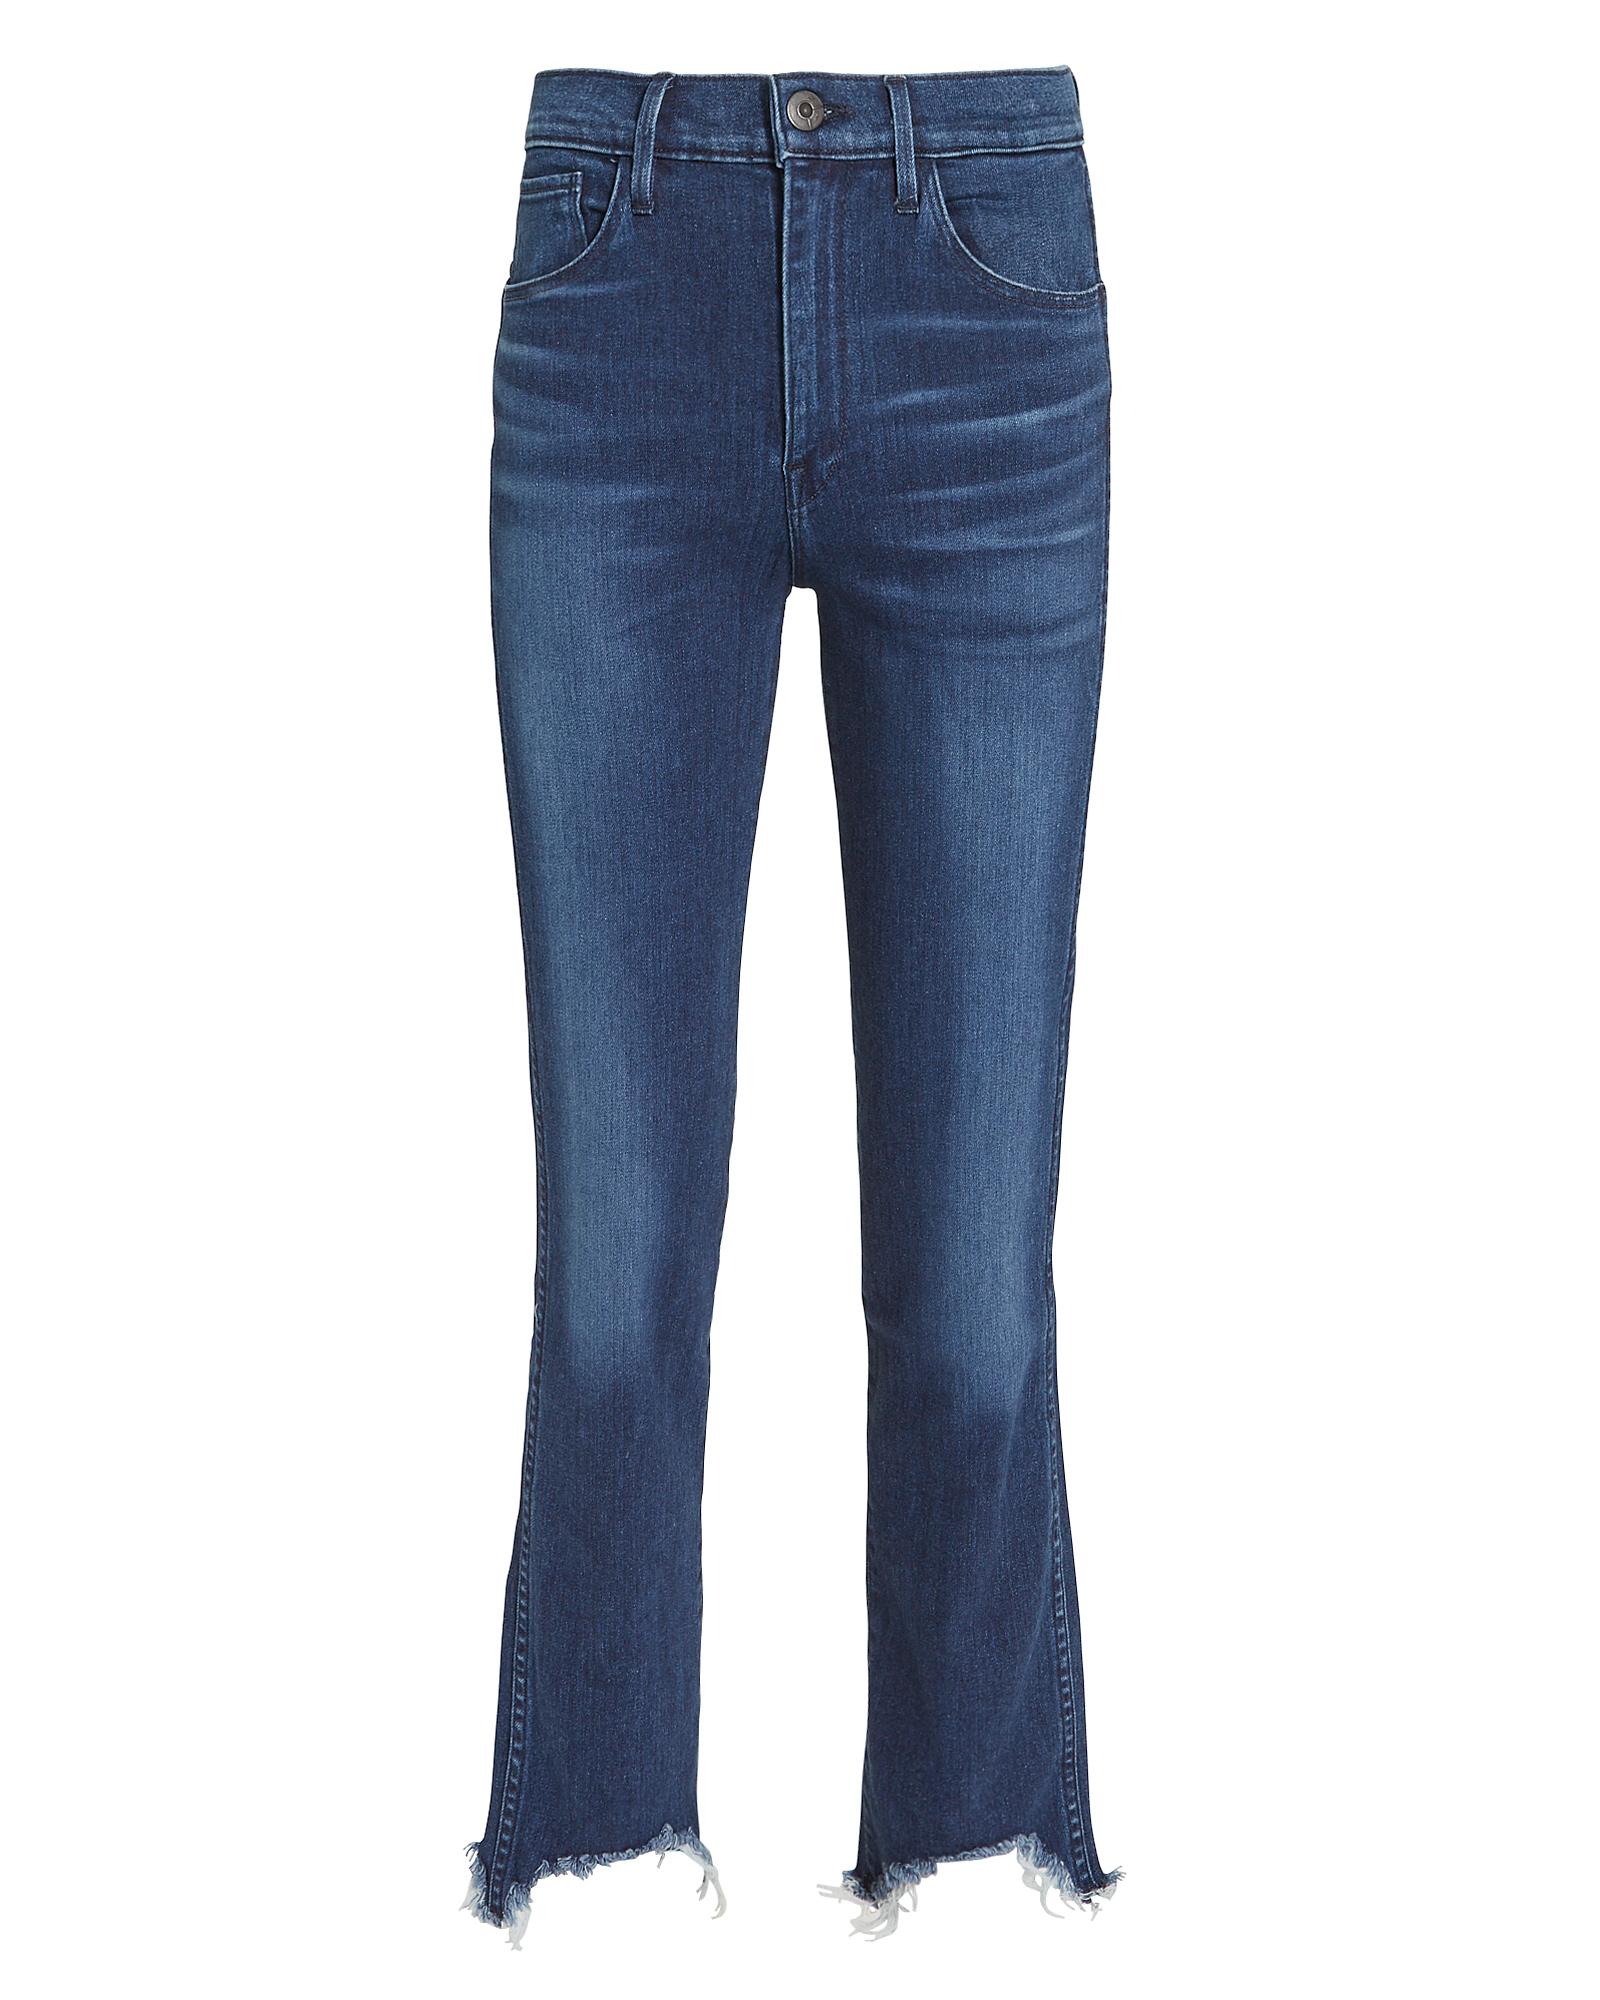 3x1 W3 Straight Authentic Cropped  Eleta Jeans